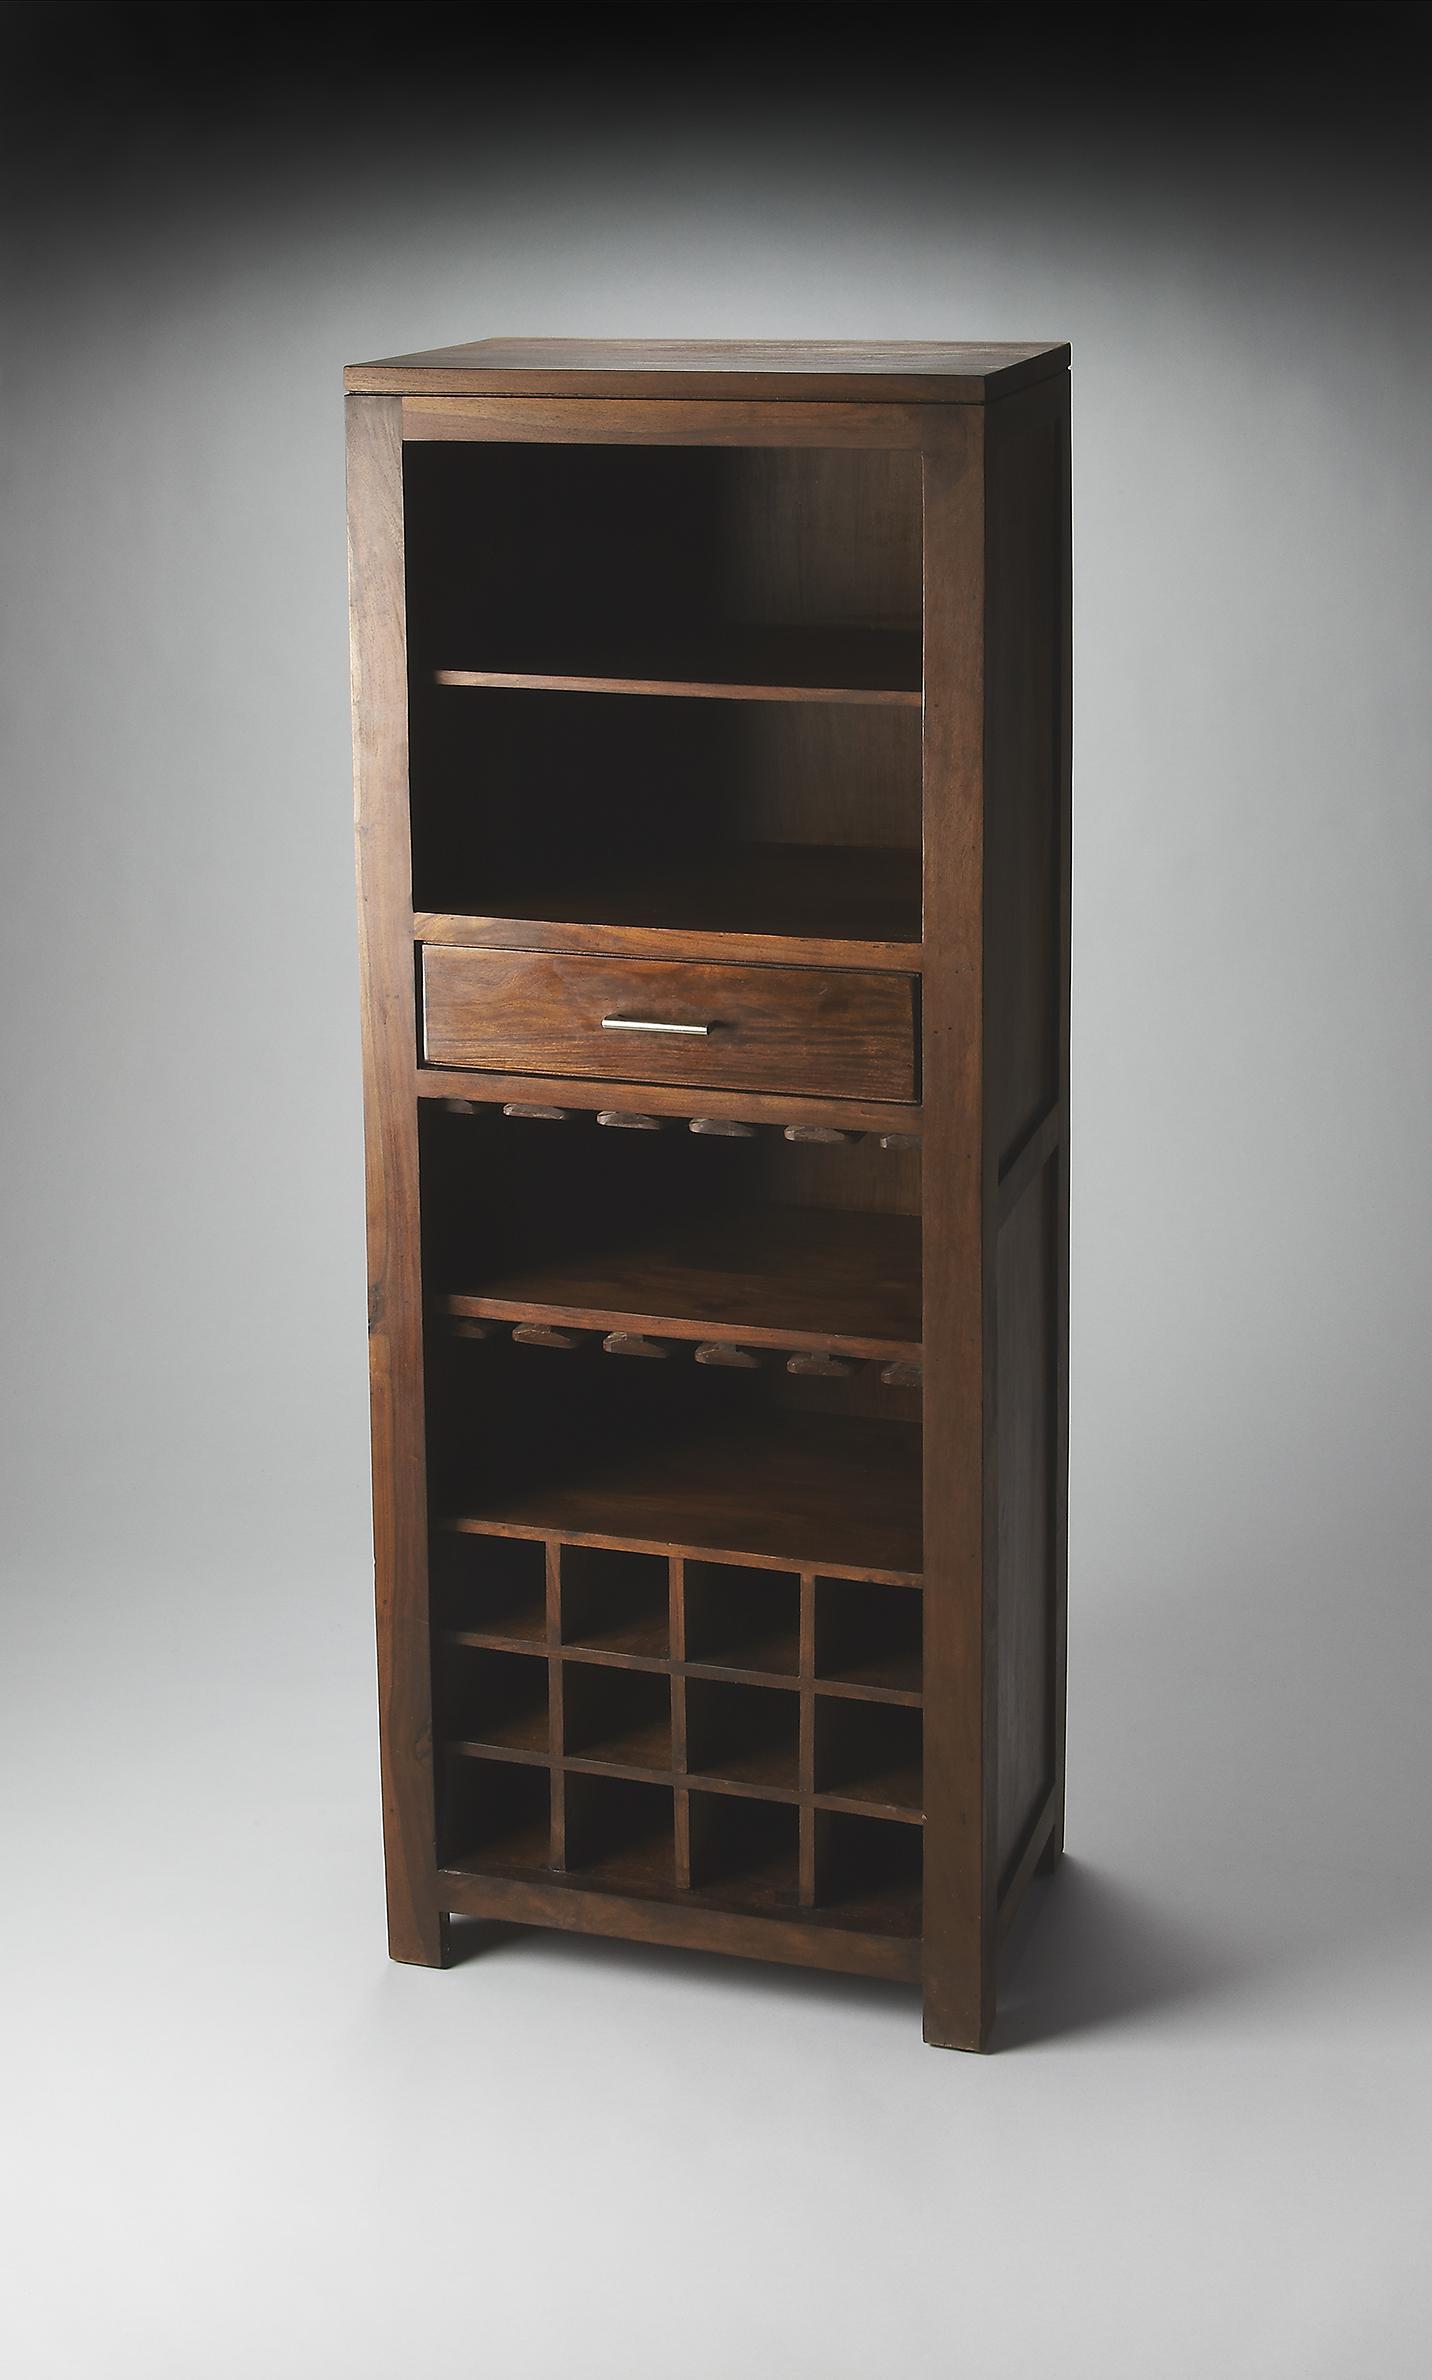 Butler Specialty Company Butler Loft Hewett Bar Cabinet - Item Number: 4246140